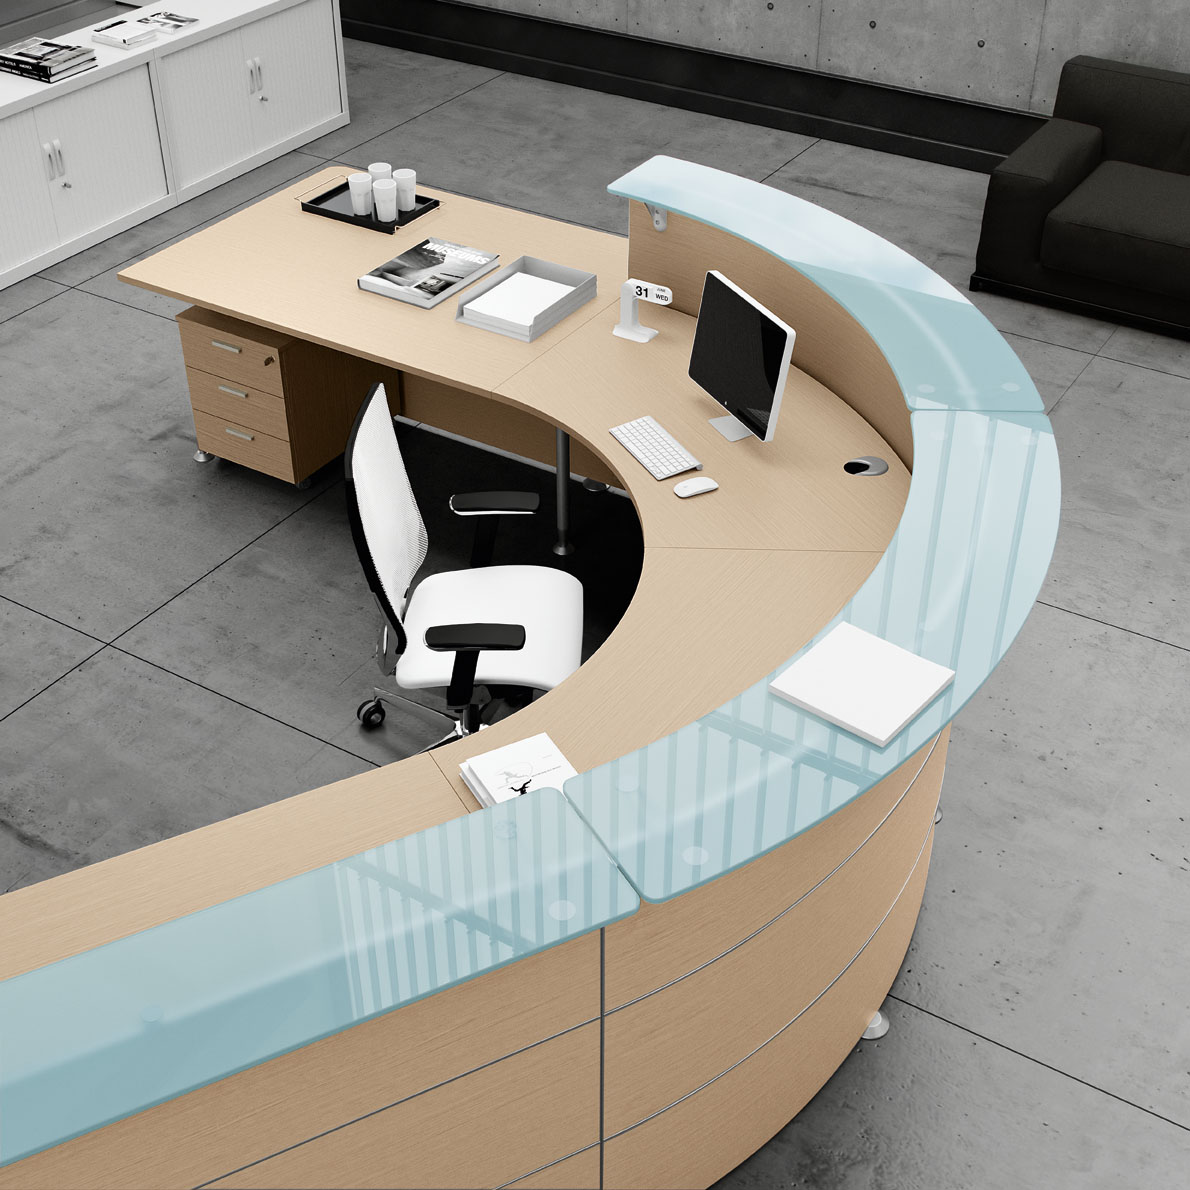 Abako toscana reception da ufficio belardi arredamenti for Mobile reception ufficio